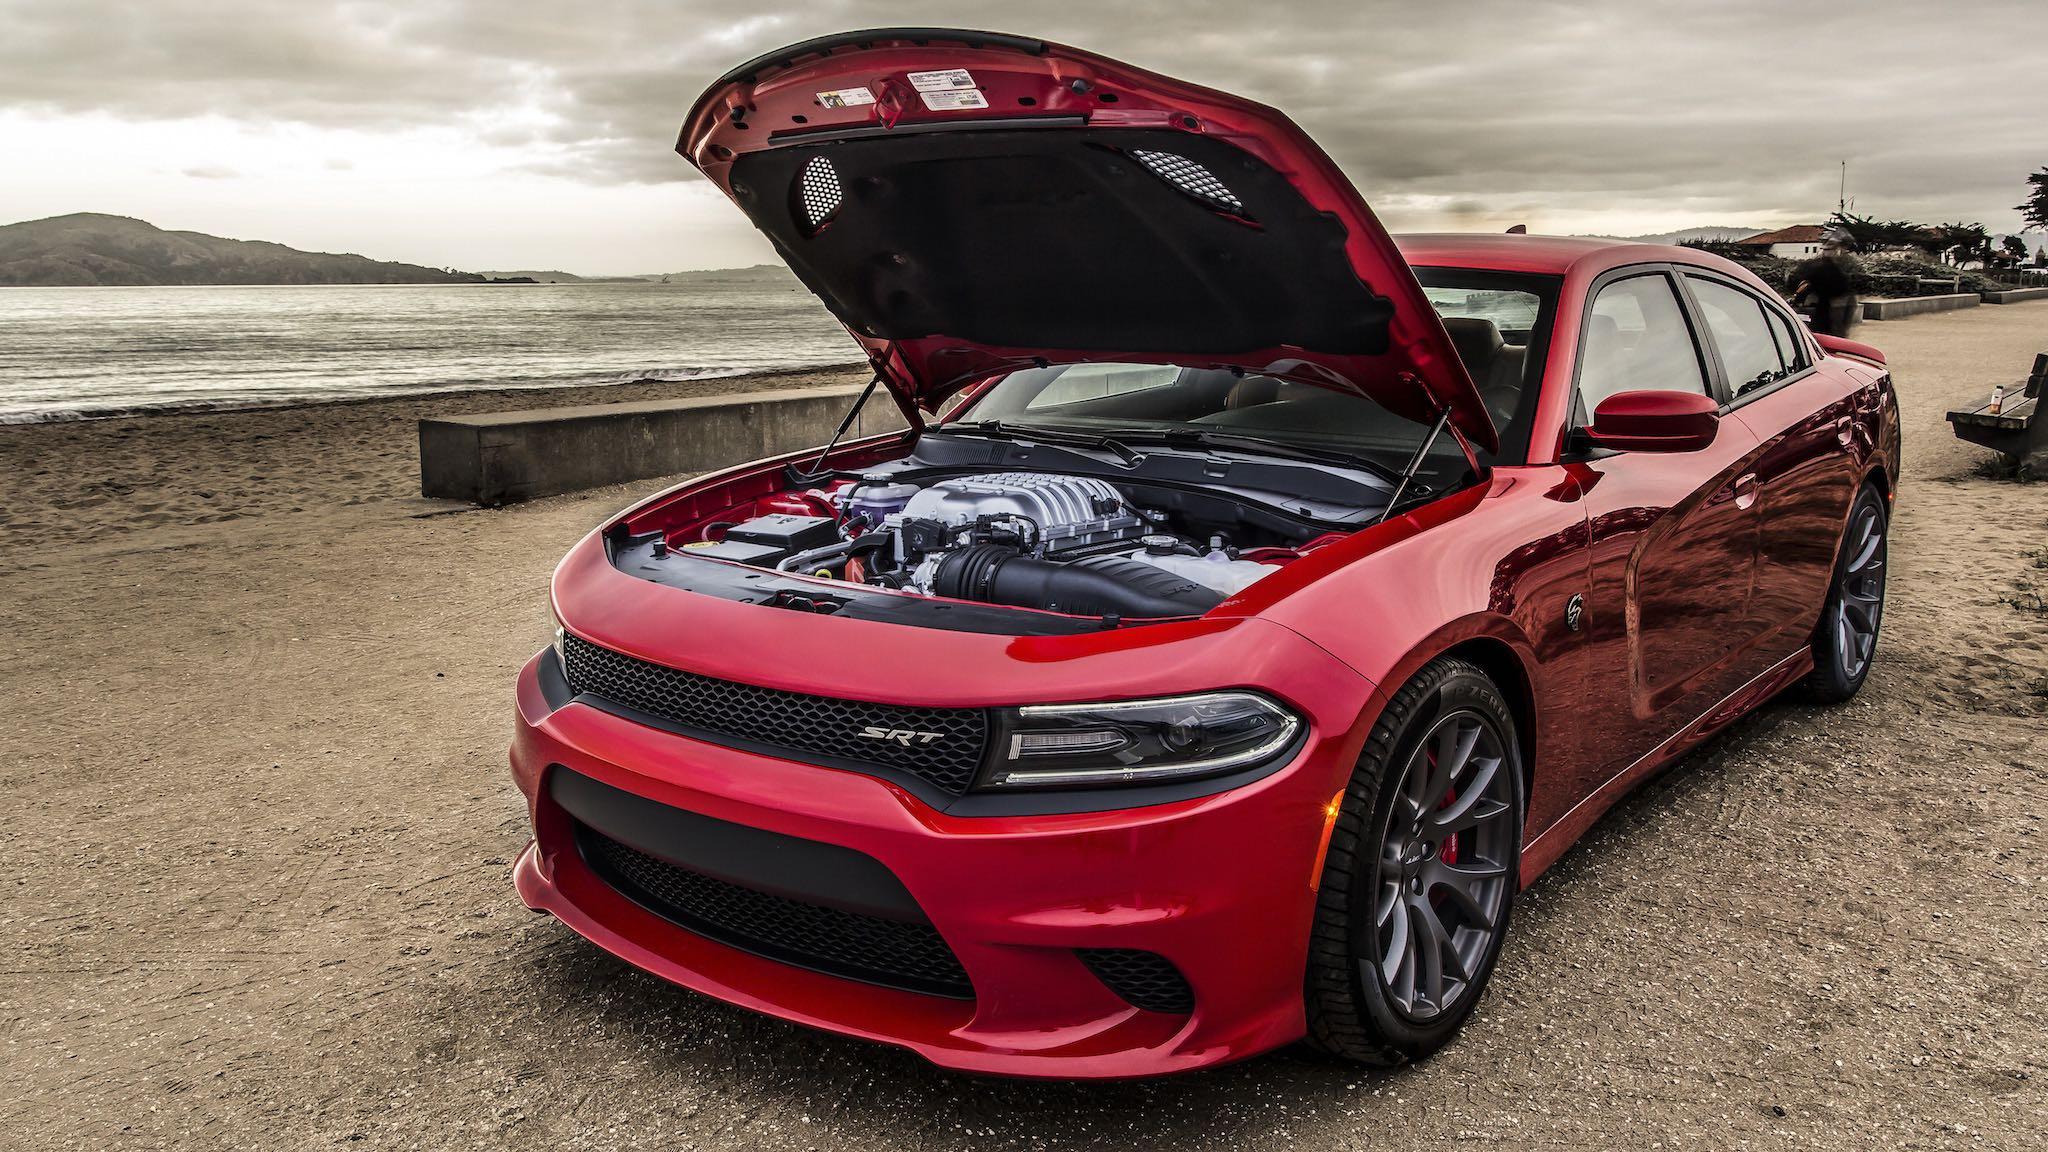 Dodge Charger Srt Hellcat Review Caradvice  Autos Post